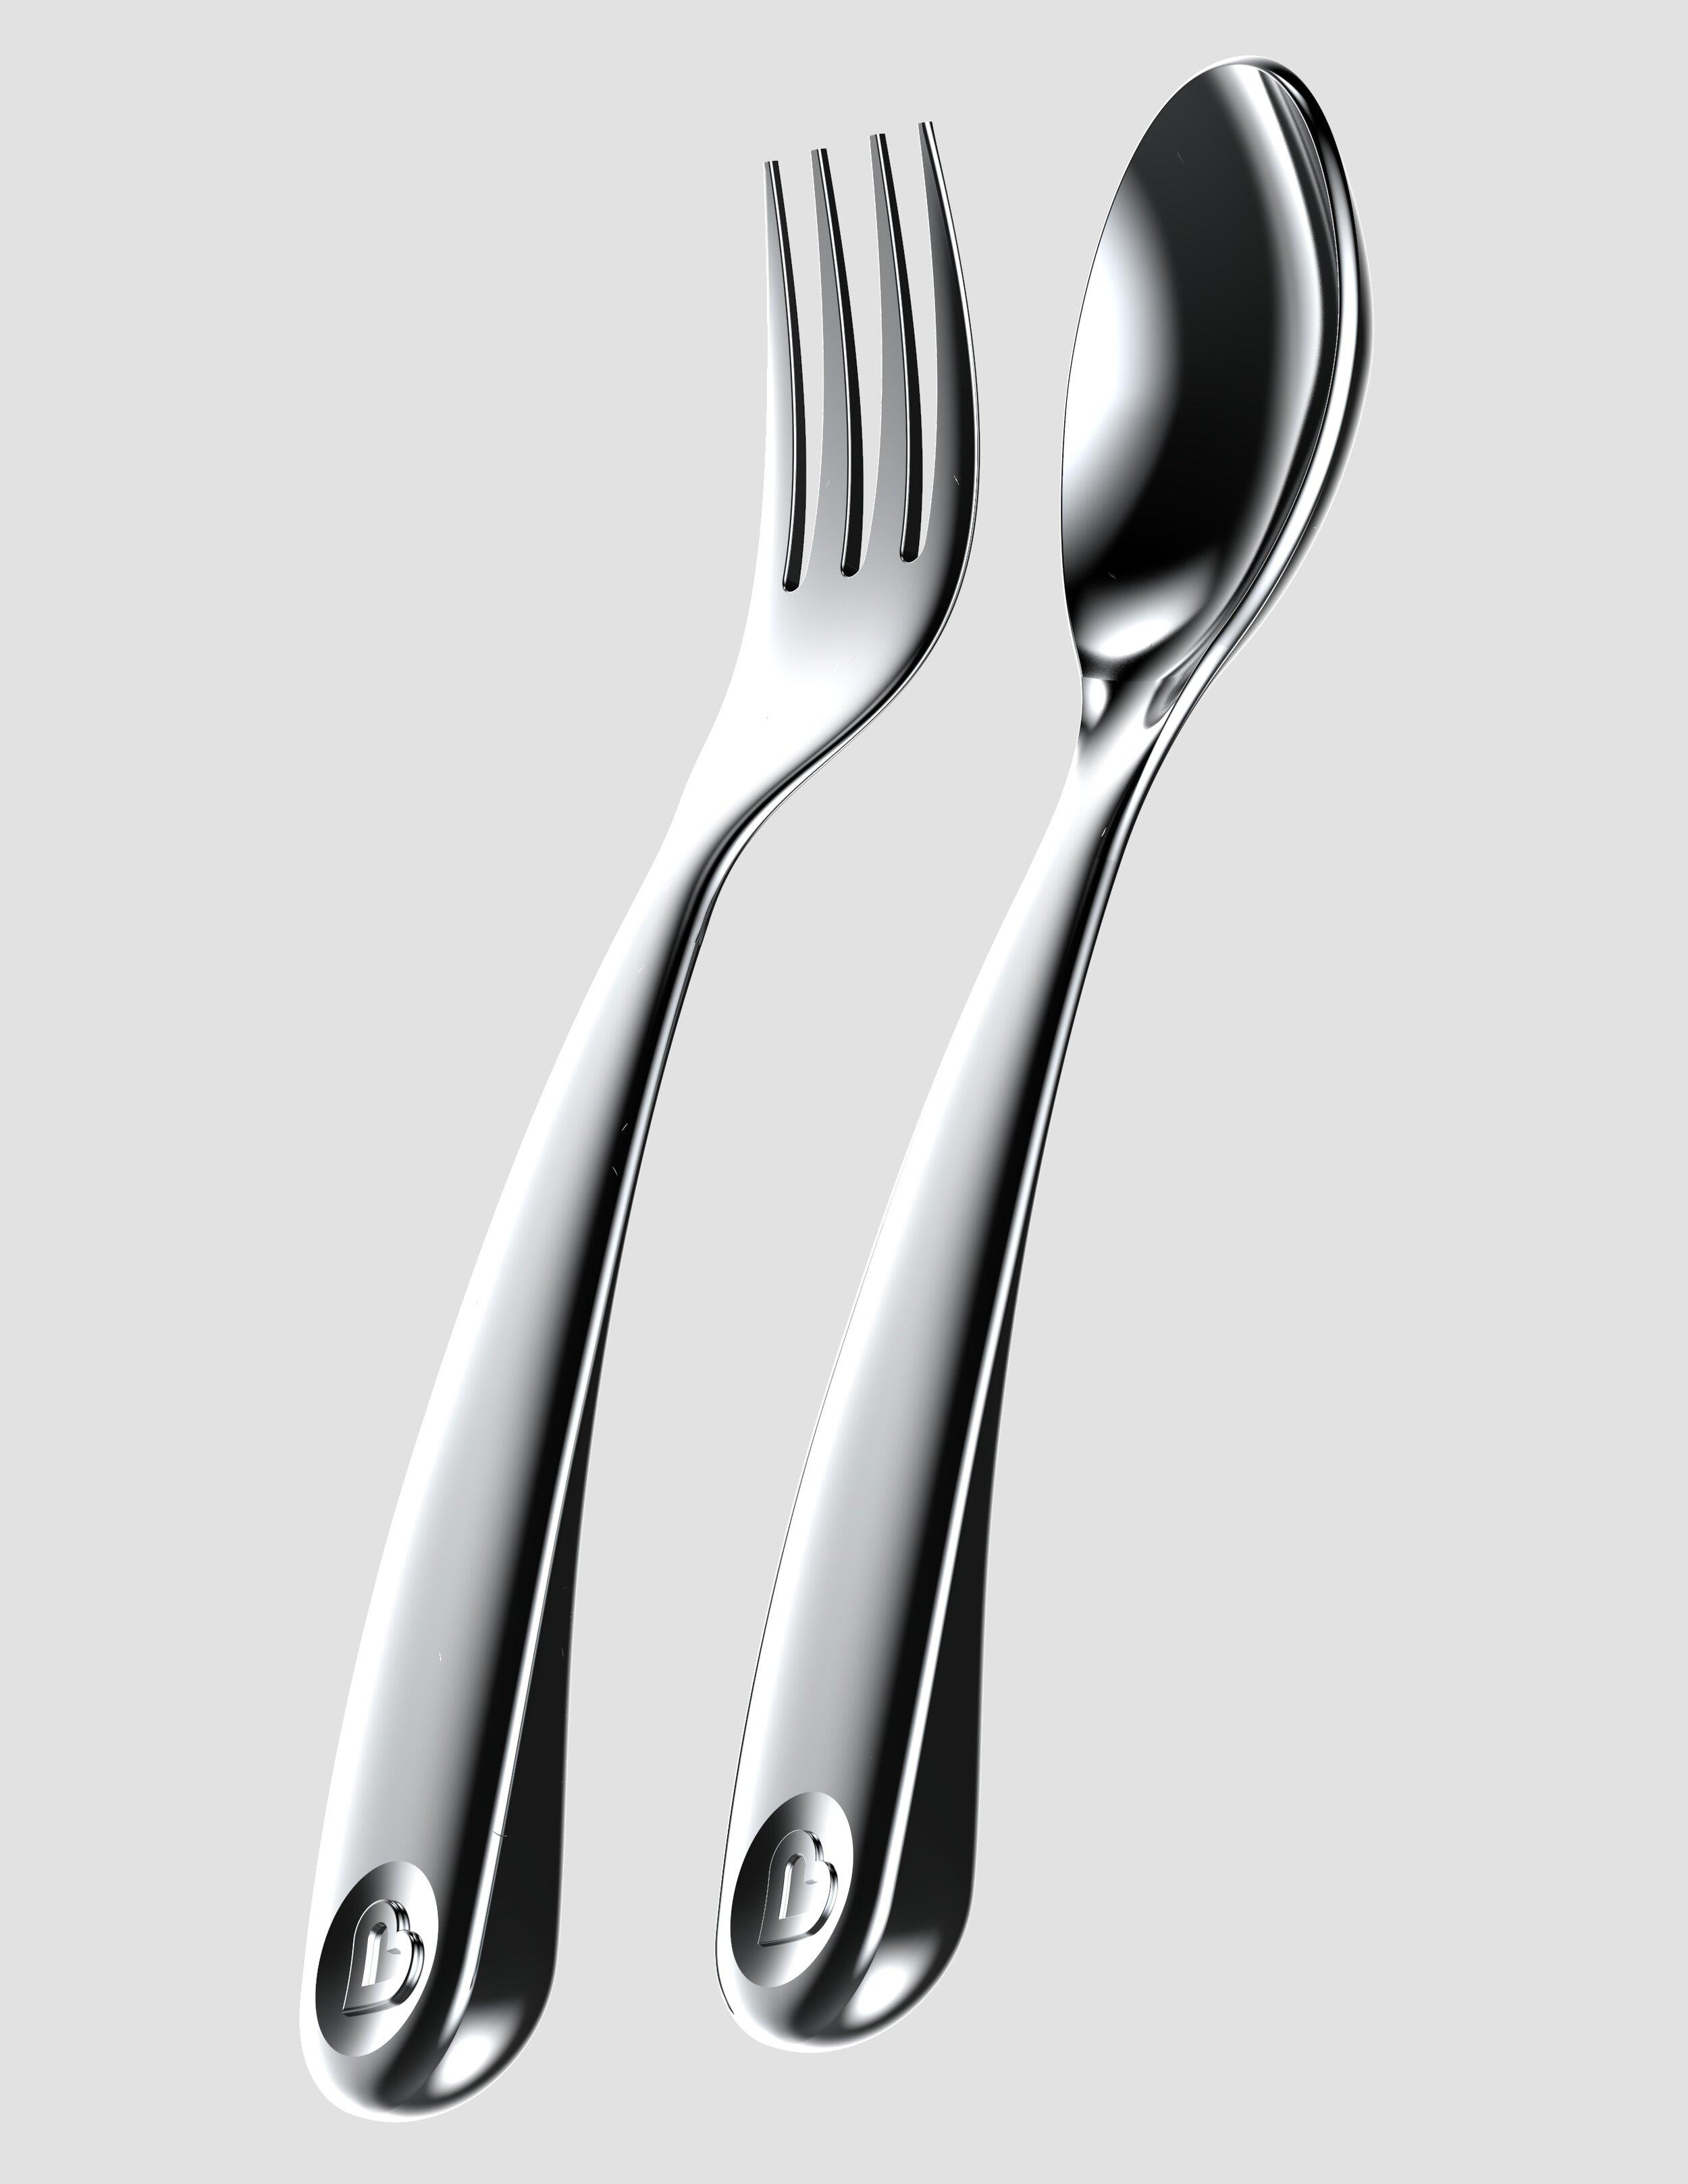 SS Fork knife and spoon - Knife 4-1 b.126.jpg